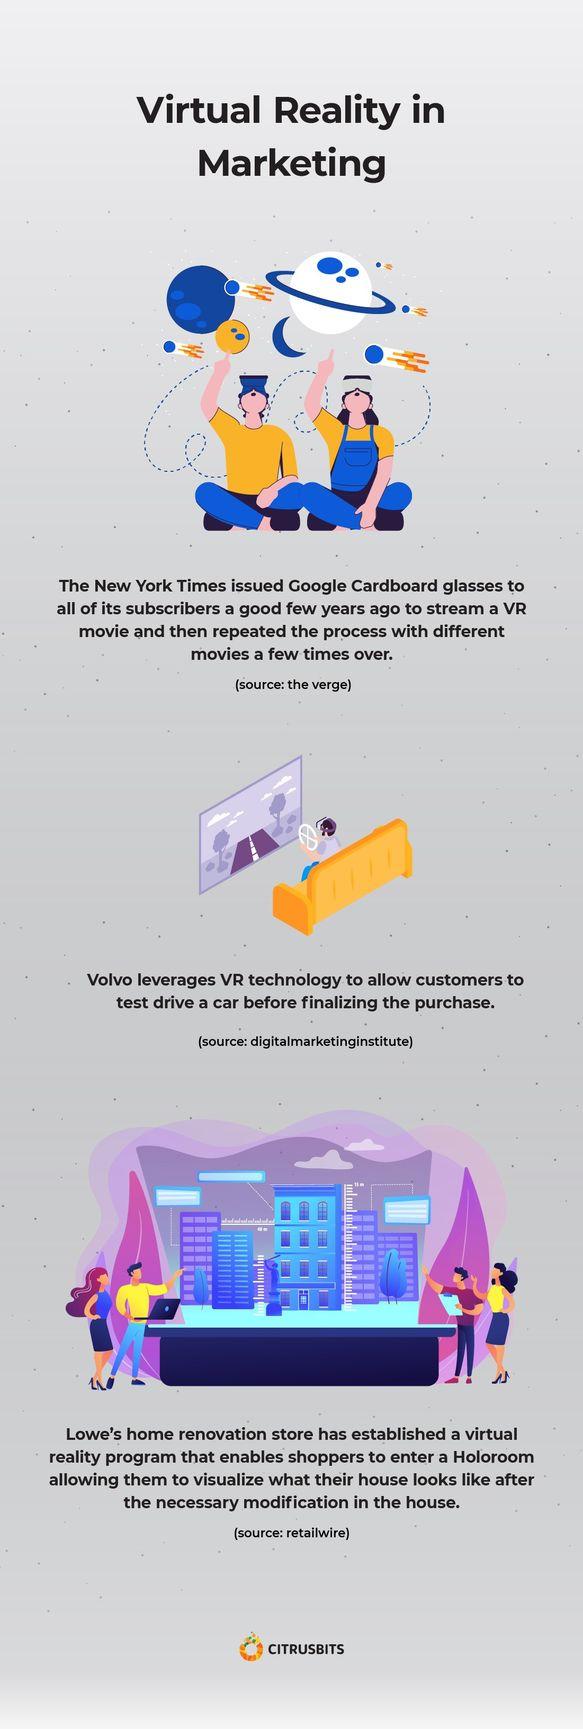 VR in marketing